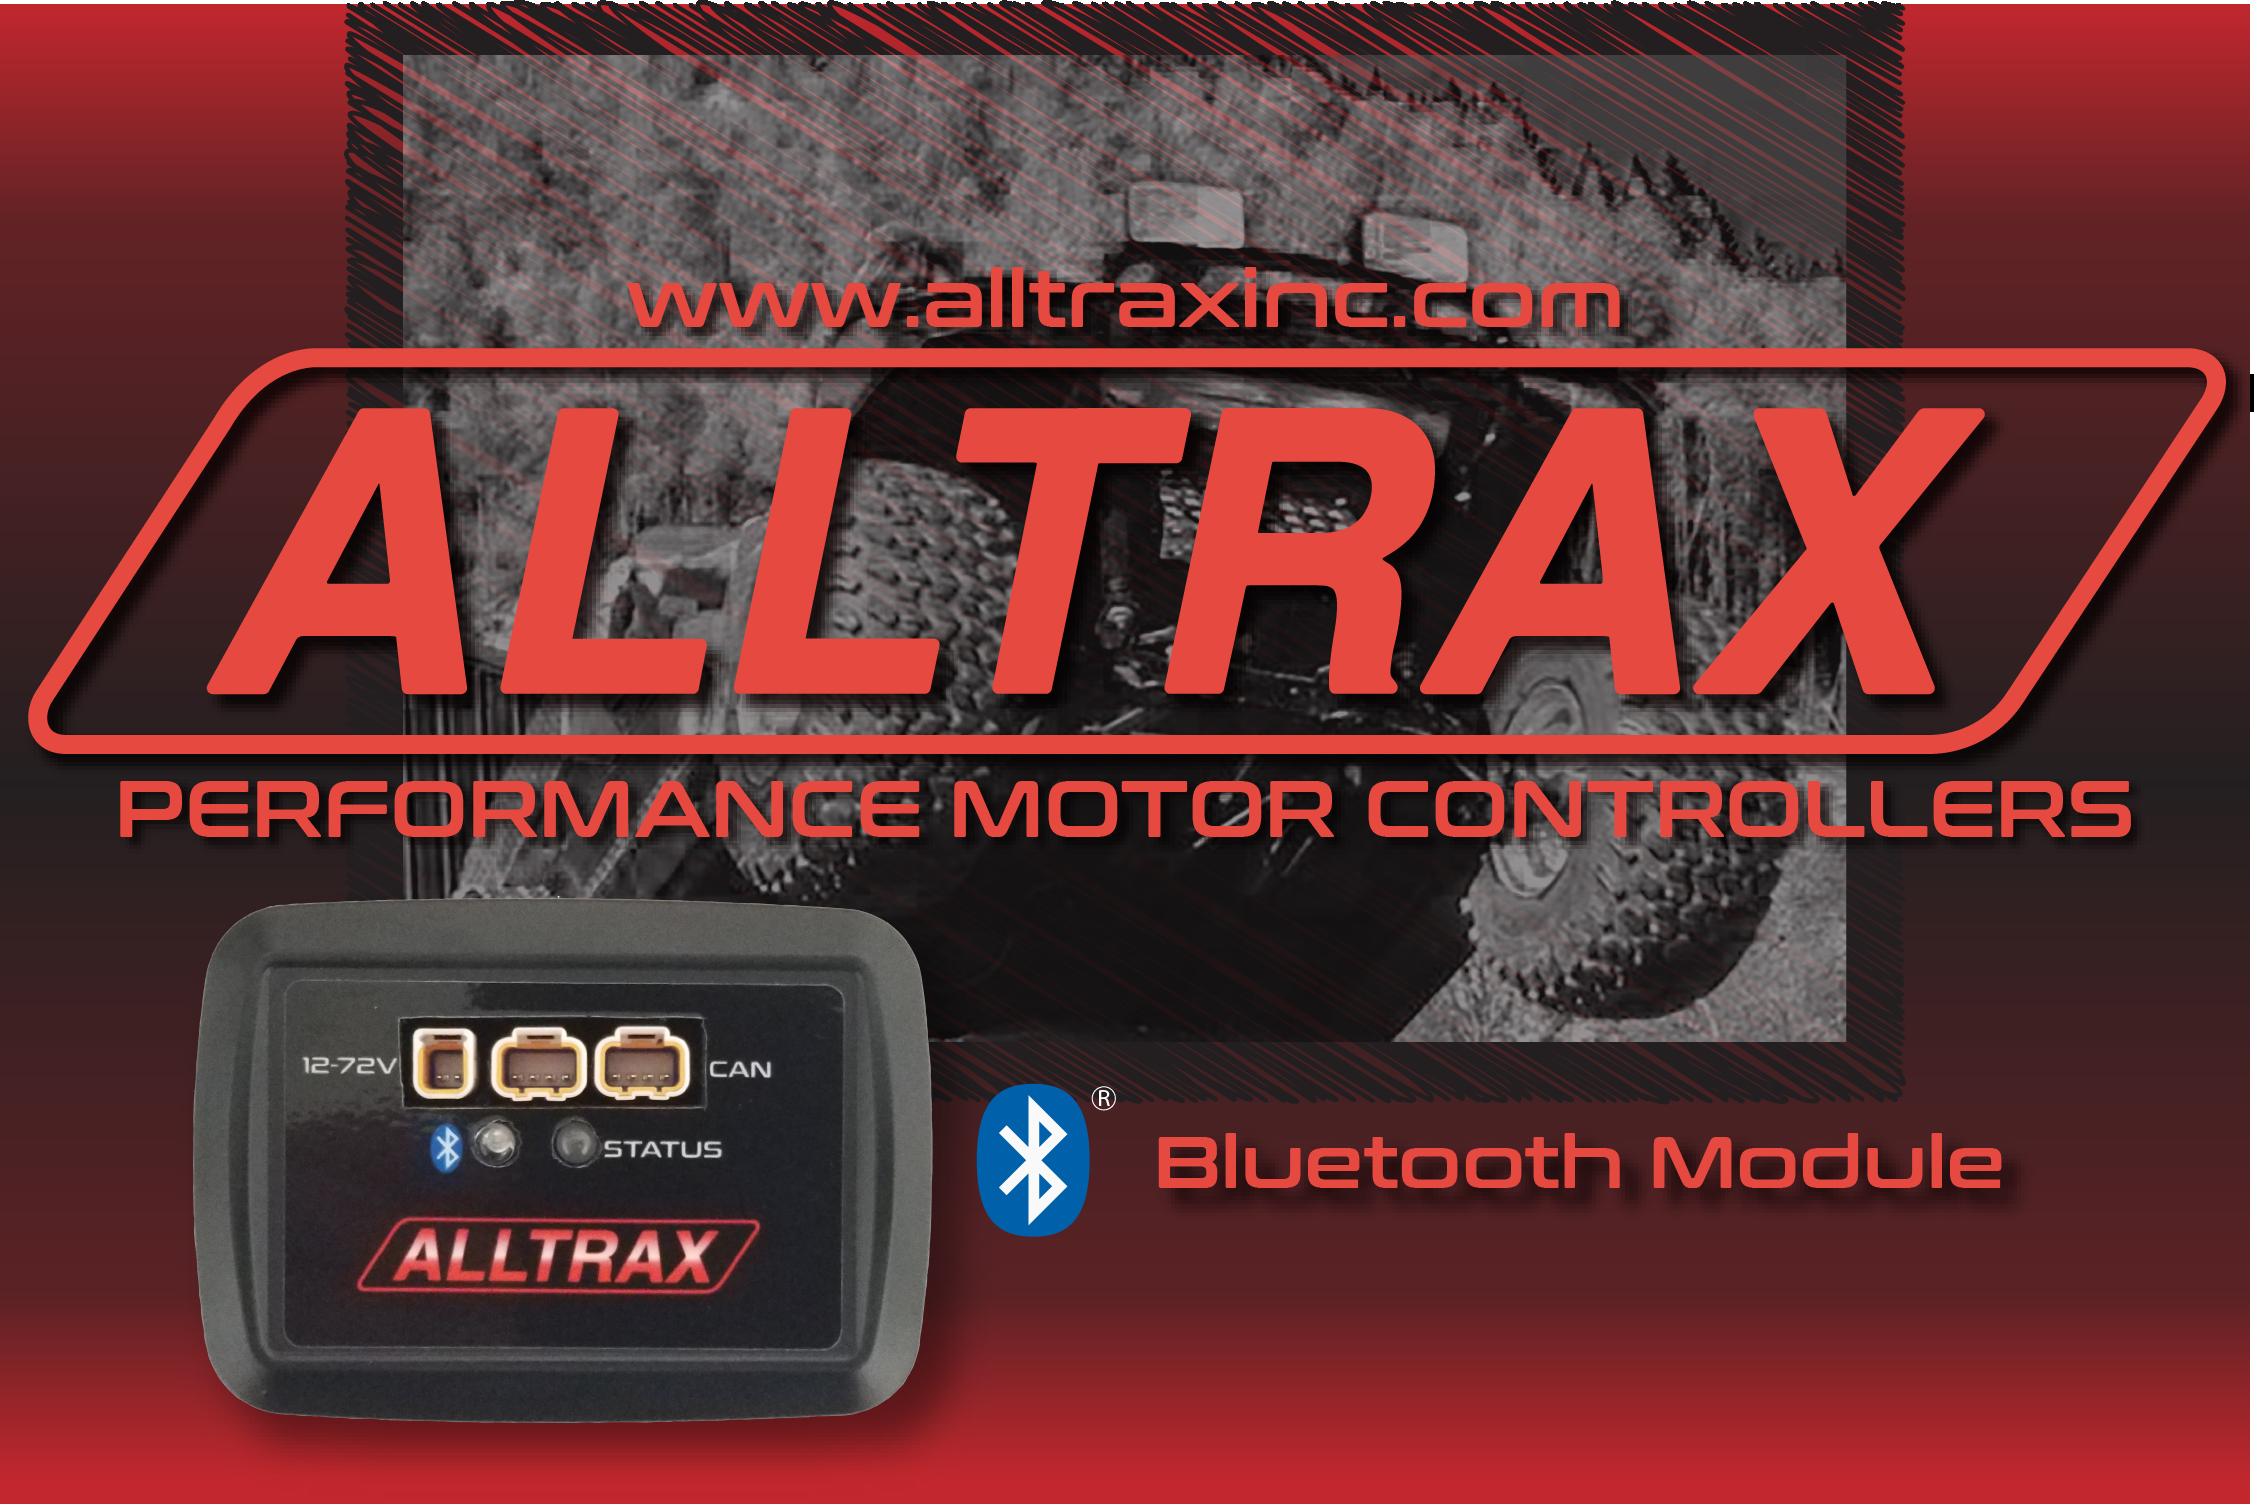 Alltrax Bluetooth Module